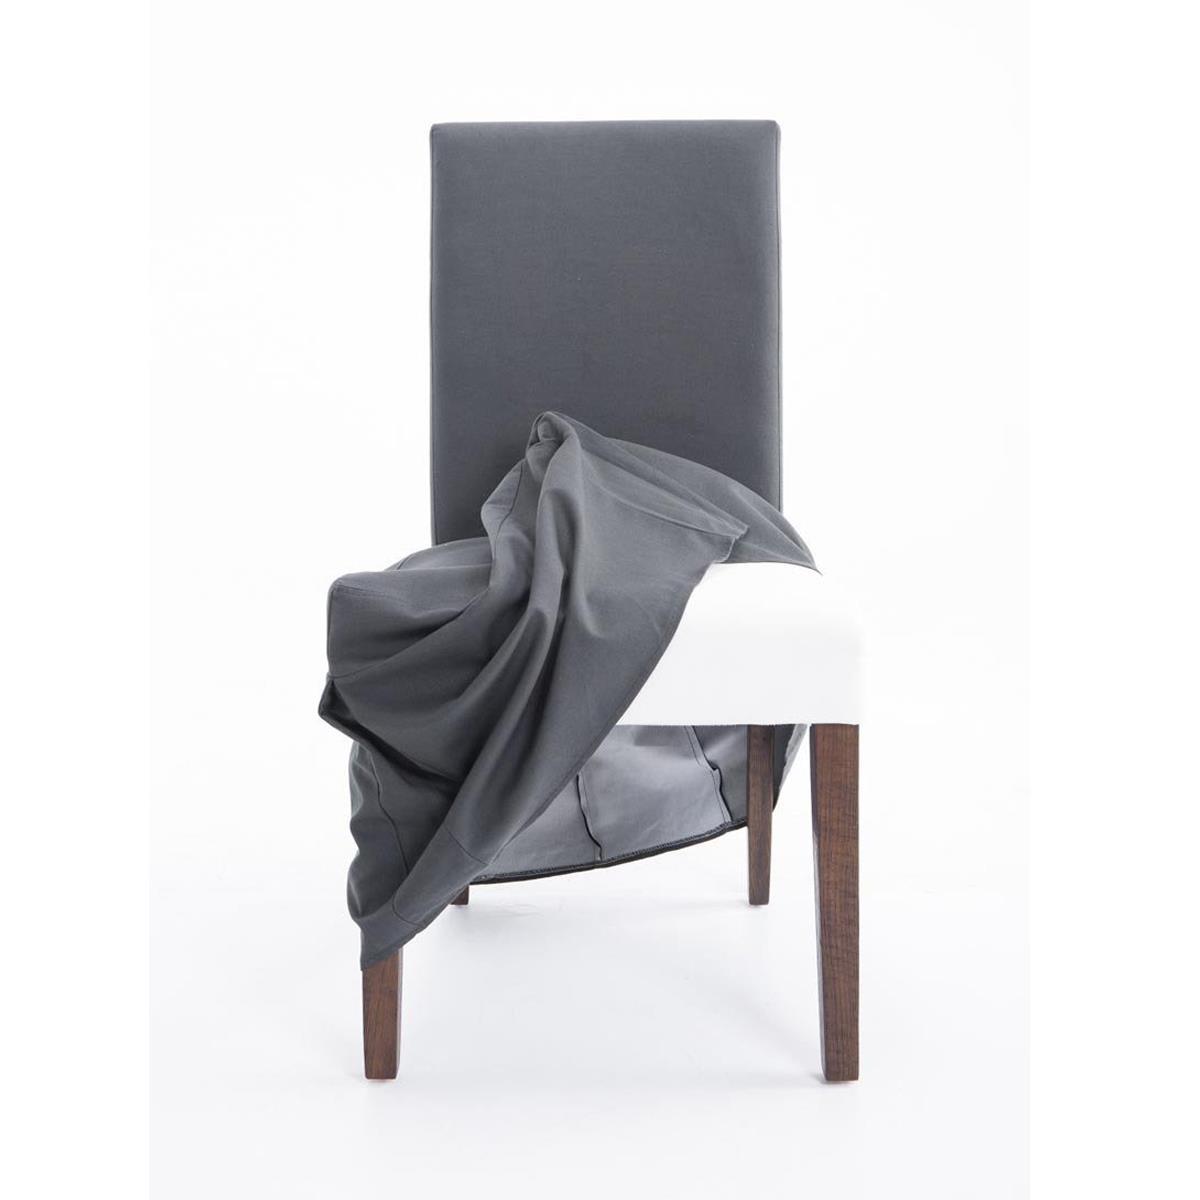 Silla de comedor caspio en tela color gris oscuro con for Sillas comedor color gris